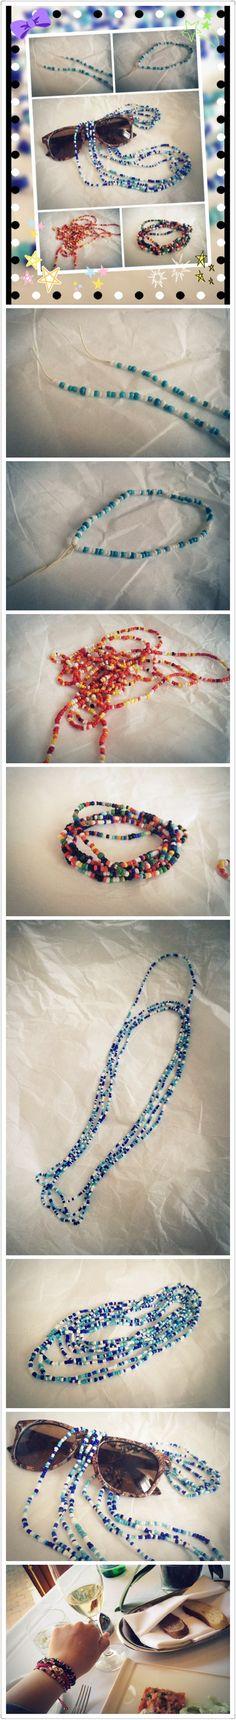 Color beads friendship 友情 knot^^ great memory fr school :p Enjoy!!  品嚐區 Fanpage: https://m.facebook.com/SAlleeesiu/?  分享link:  http://siusally.blogspot.hk/2014/06/salleeeaccessory-beads-of-color.html?m=1